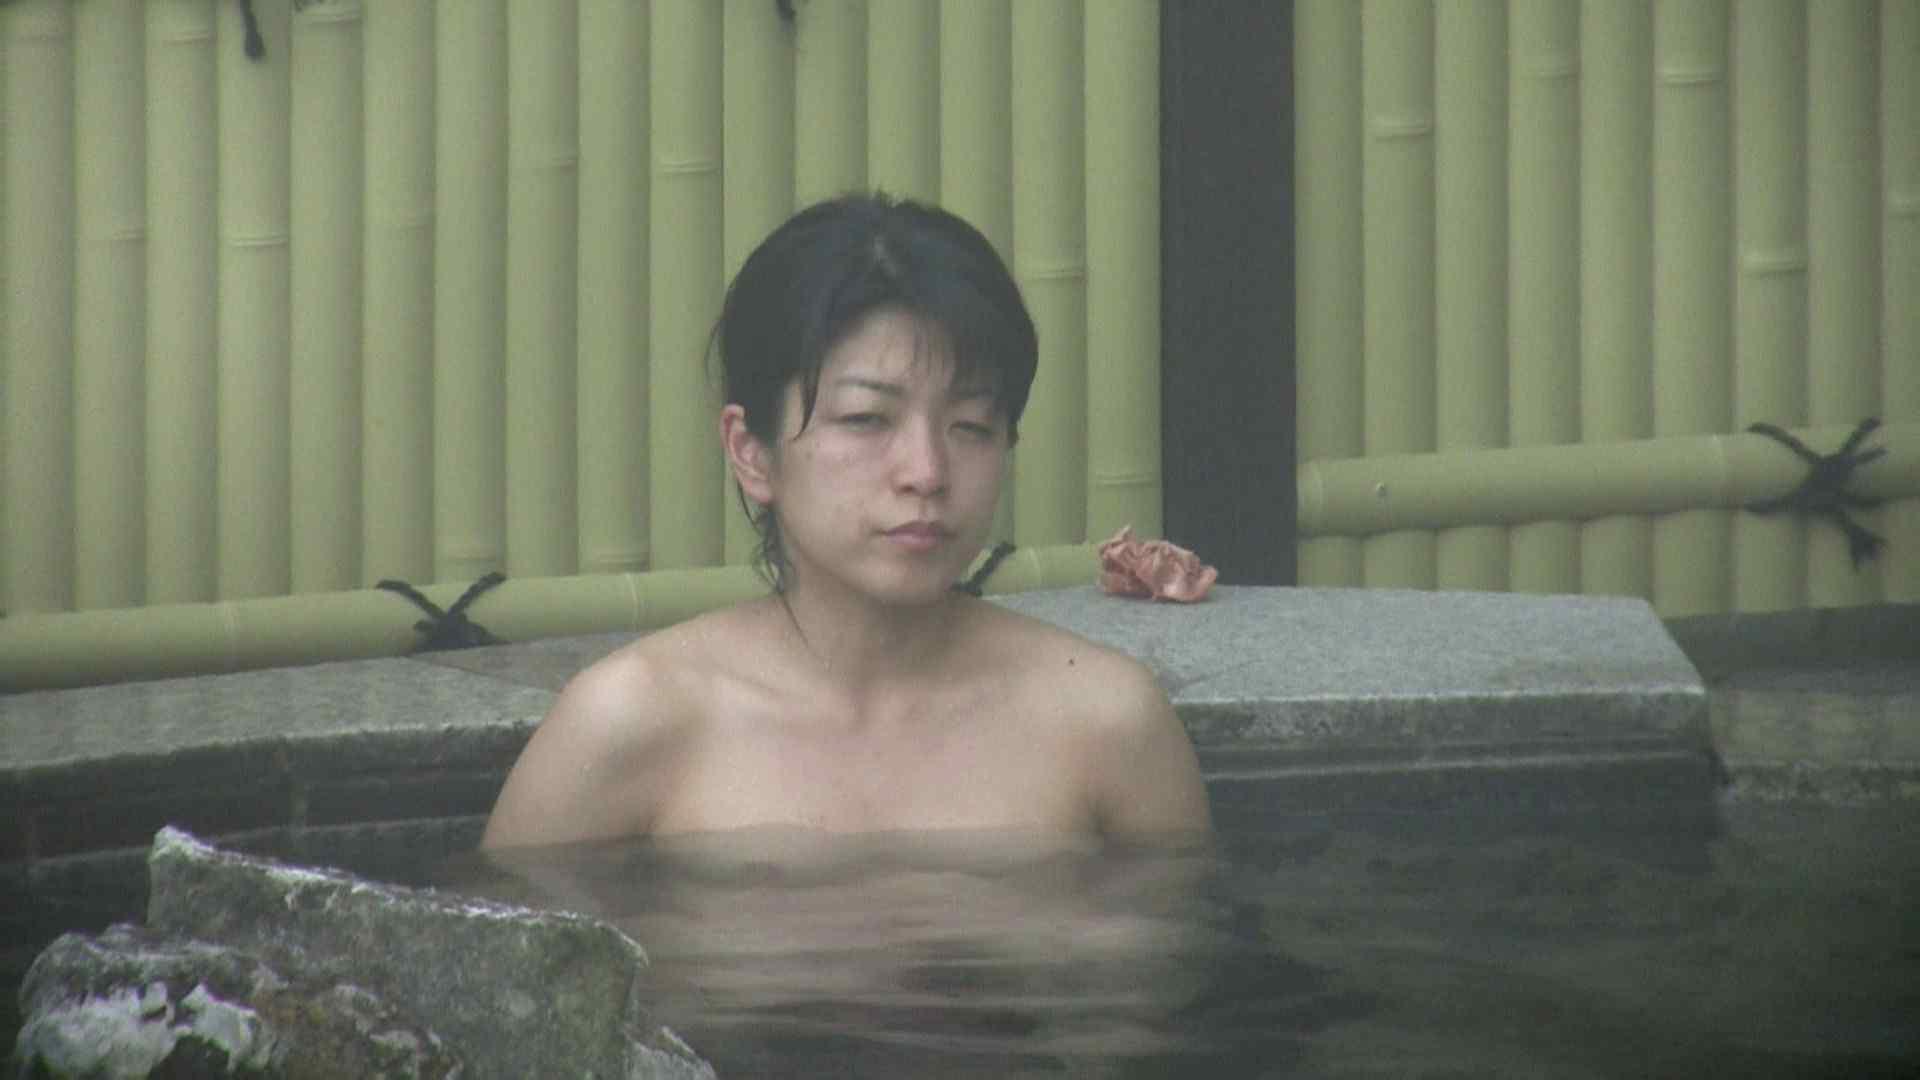 Aquaな露天風呂Vol.585 HなOL | 盗撮  93pic 88